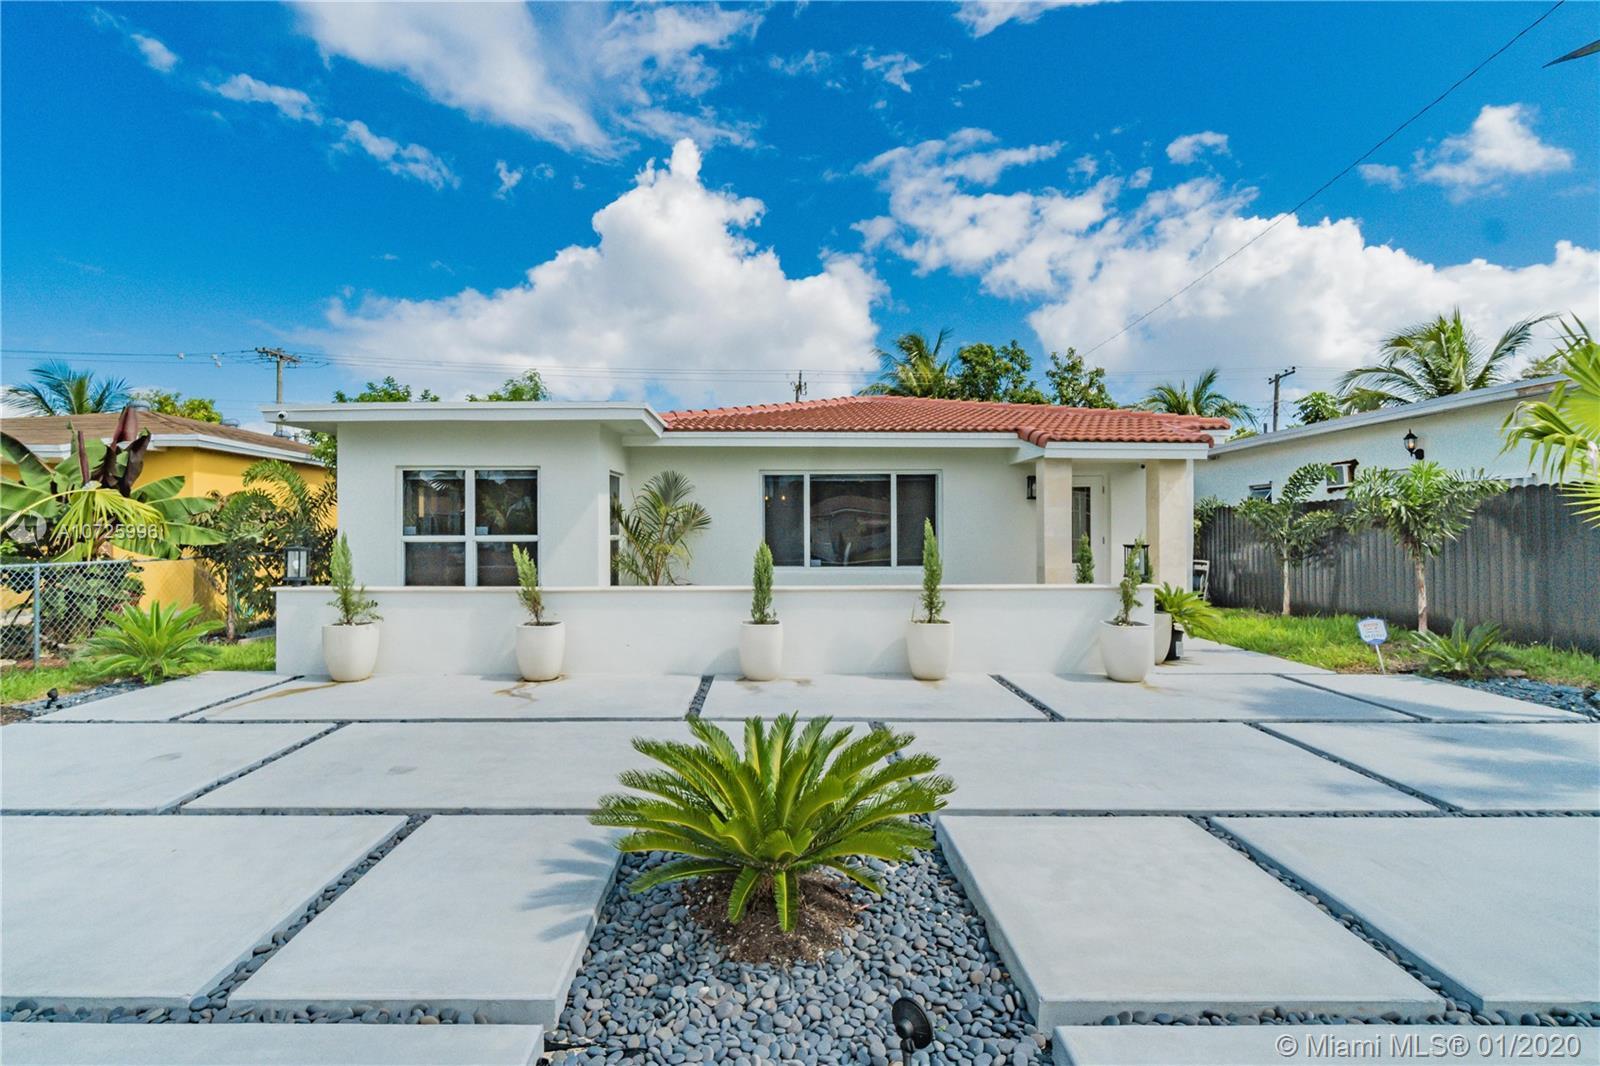 1731 NE 172nd St, Miami Shores, Florida